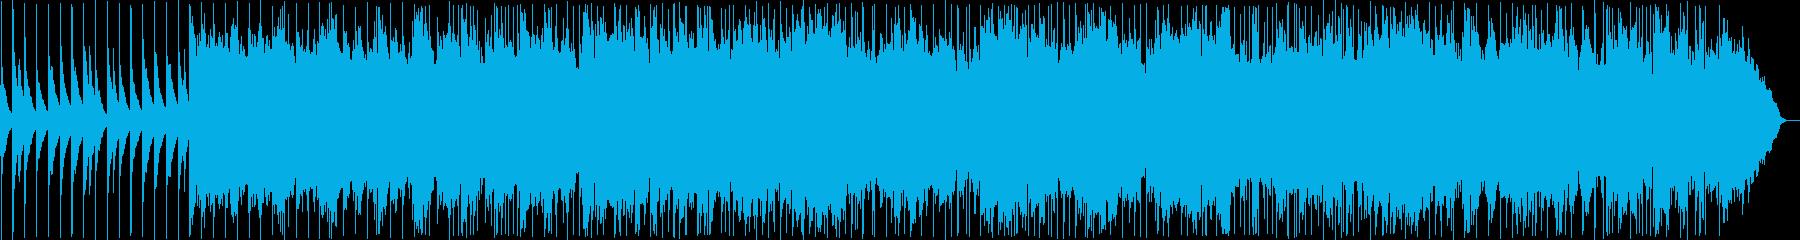 Tingusannu flower / Okinawa folk song's reproduced waveform